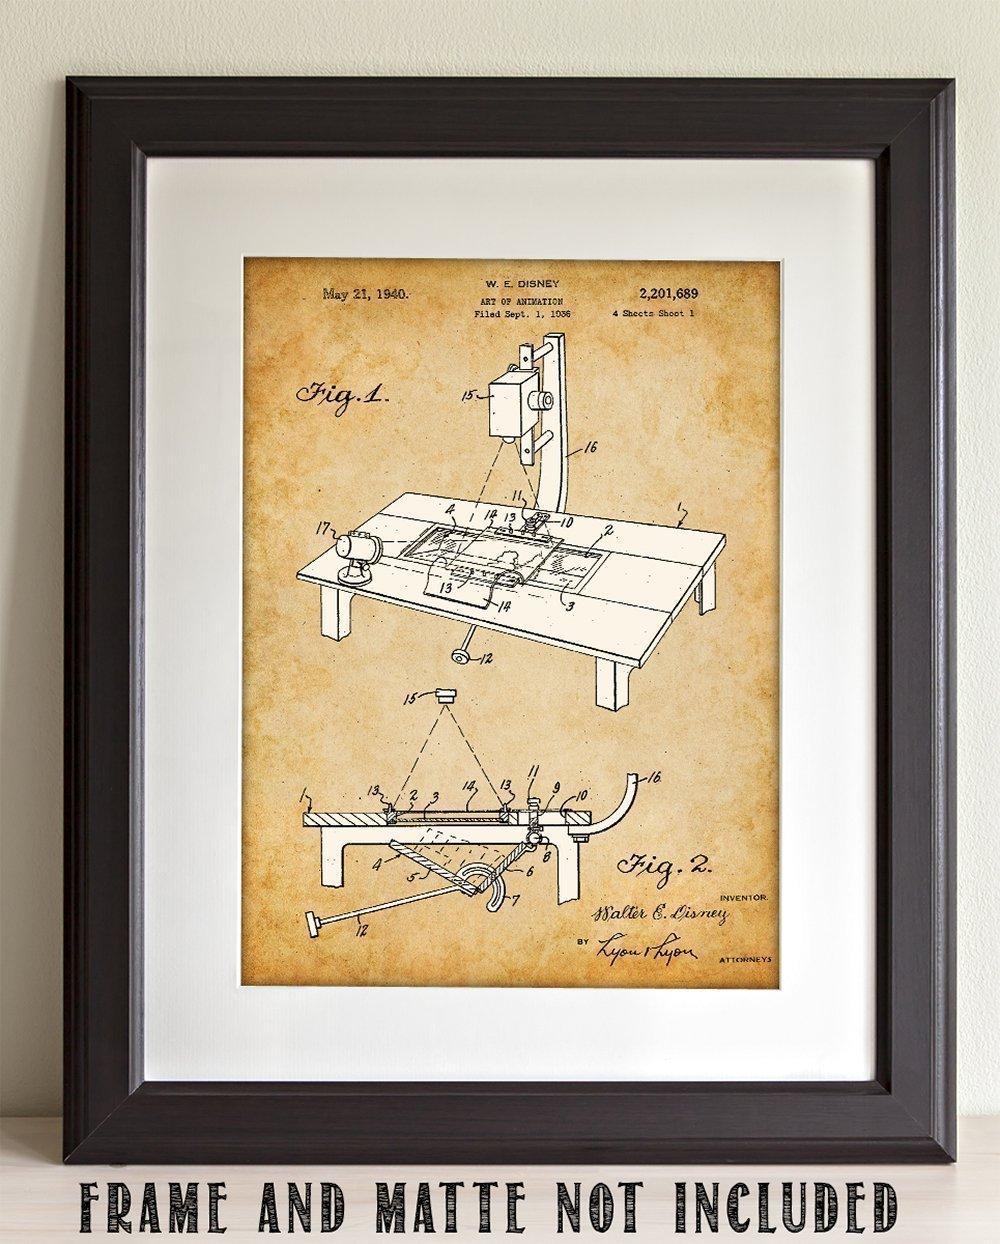 Amazon.com: Walt Disney Art of Animation - 11x14 Unframed Patent ...